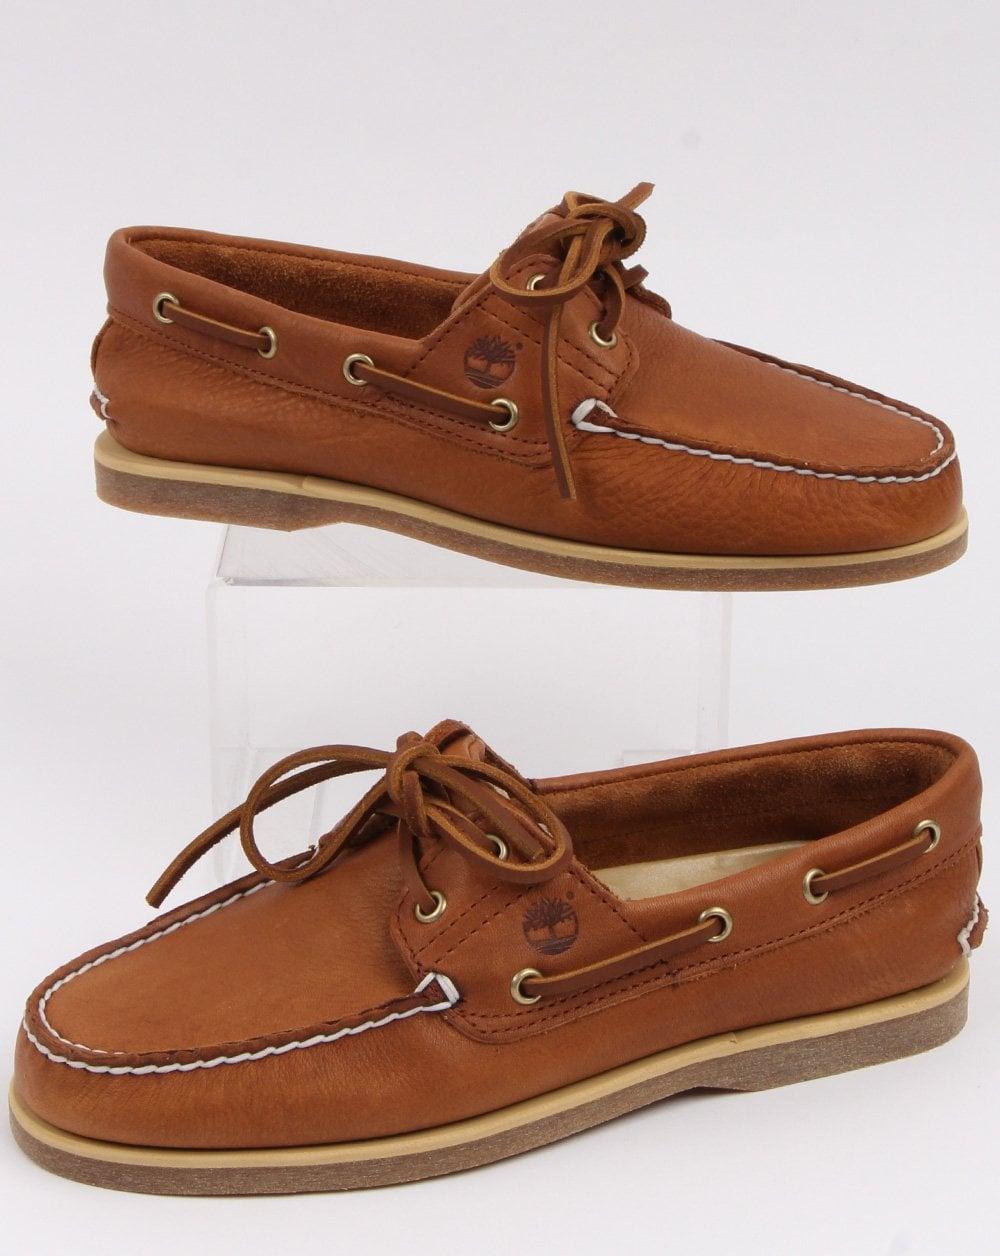 Timberland Classic Boat 2 Eye Shoe Tan